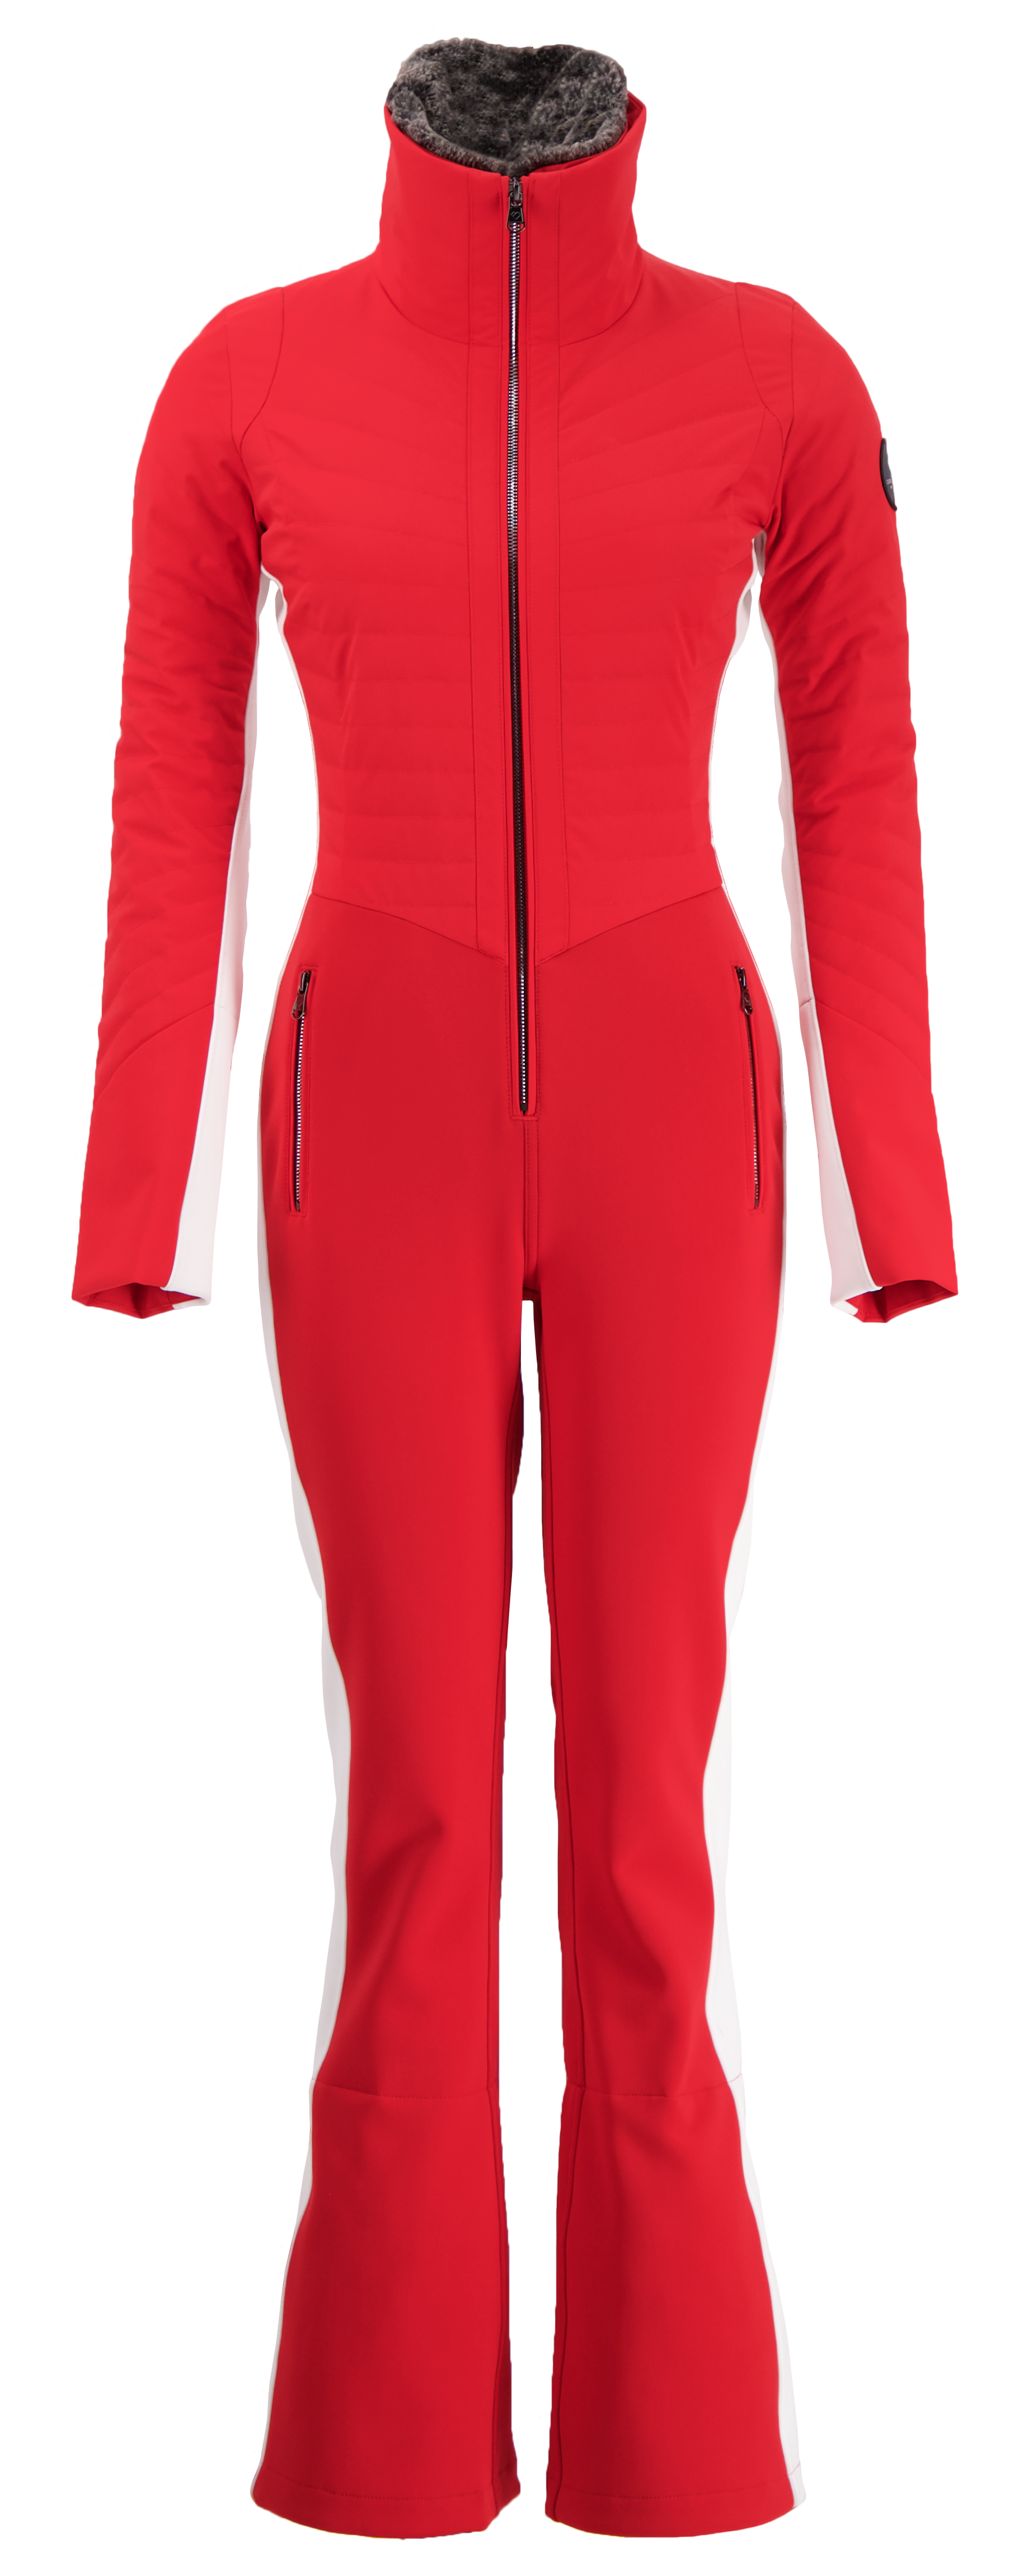 Spyder Slalom Jacket